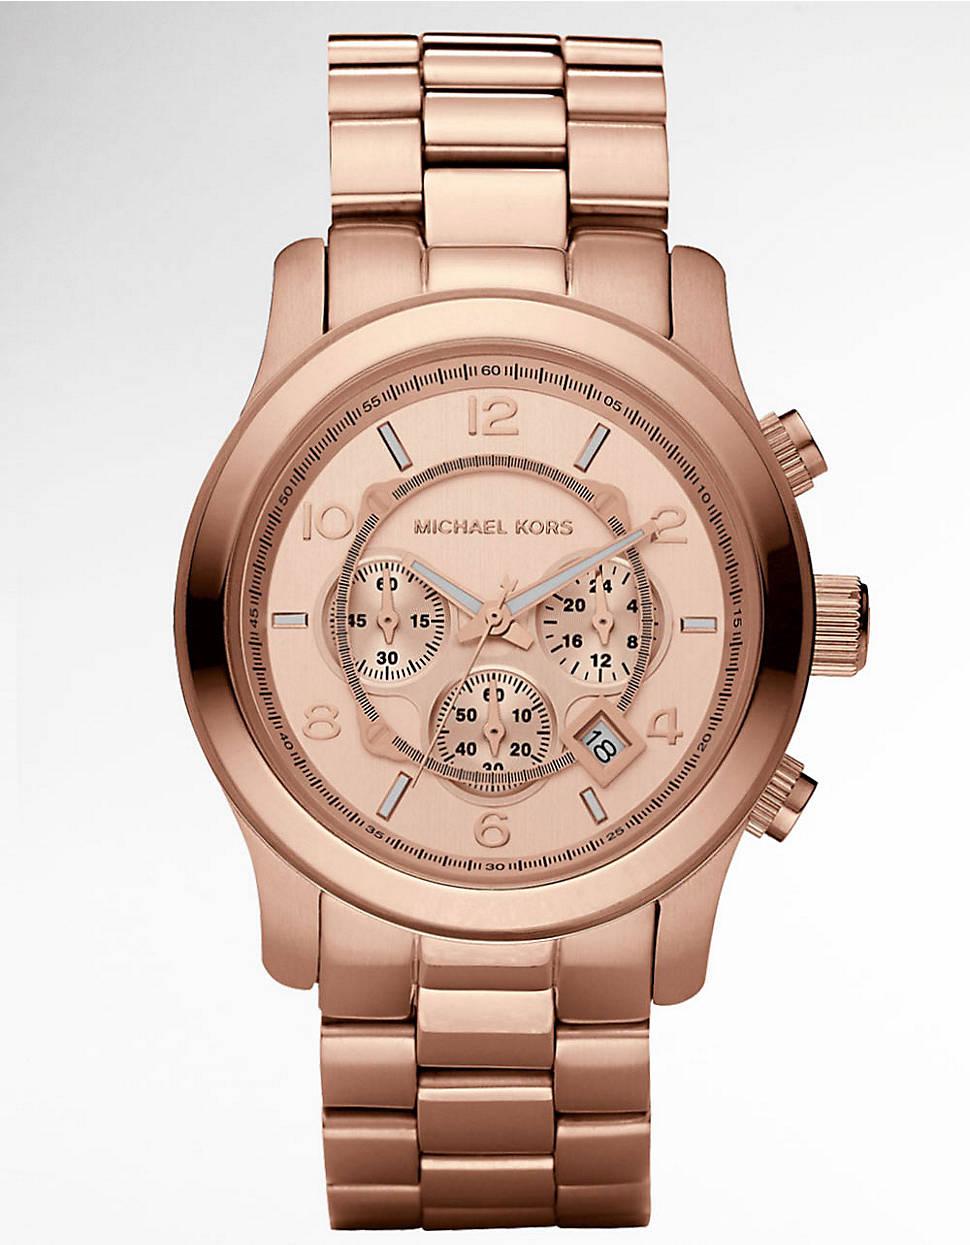 michael kors mk5676 ritz goldtoned watch for women in